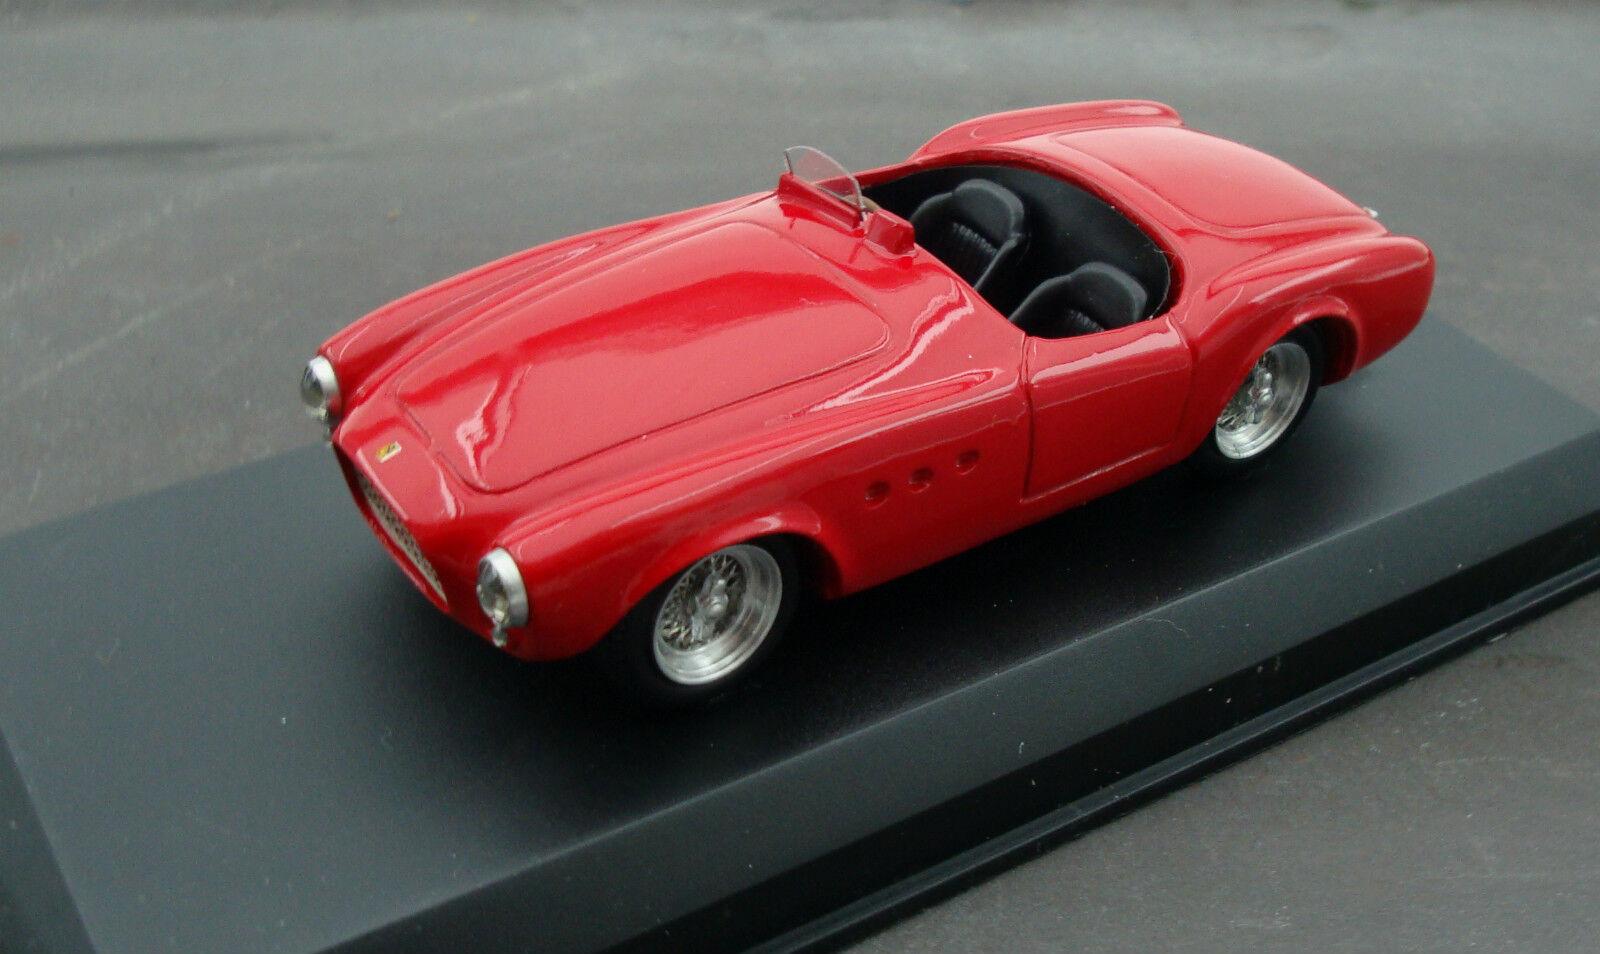 Ferrari 225 S S S 1952-Série 3000 Street Line-tmc3001 TOP MODEL 1 43 - Neuf fffa20